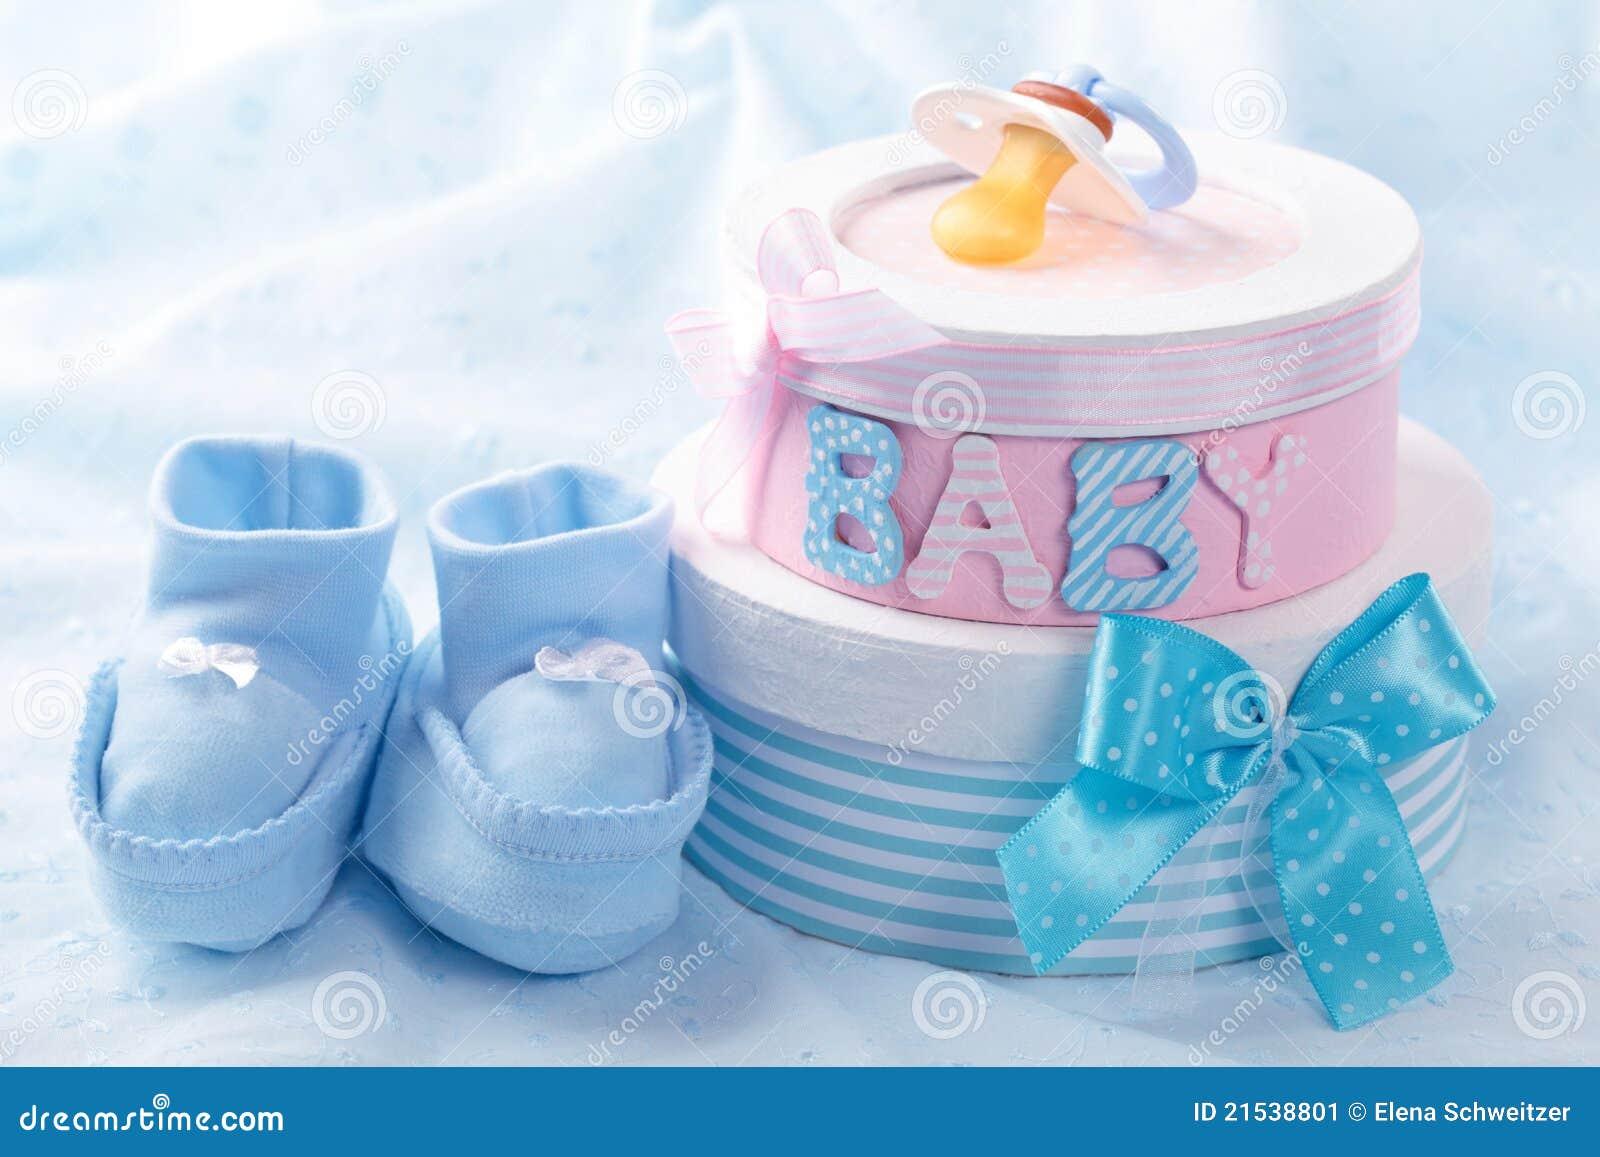 Little blue baby booties